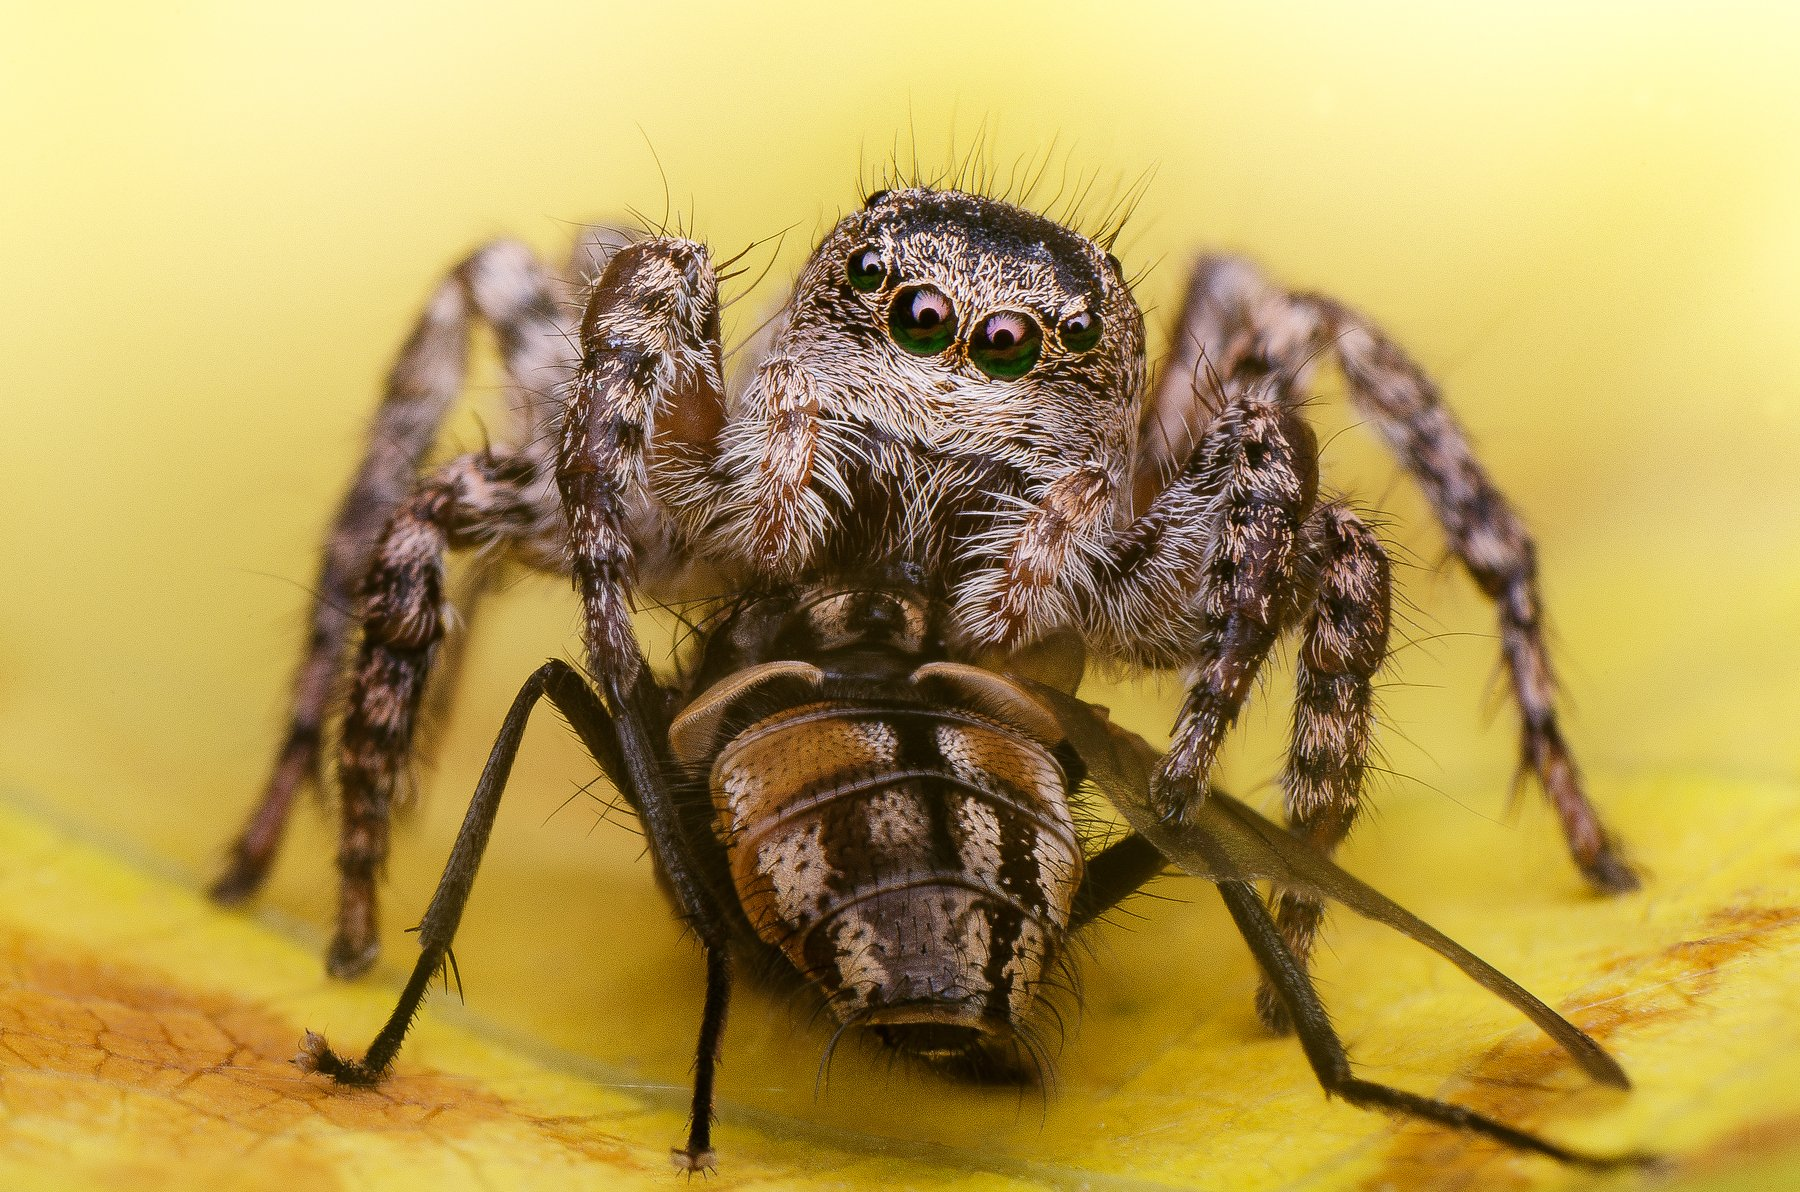 скакун паук осень муха жертва еда пища хелицеры , Ренат Тугушев